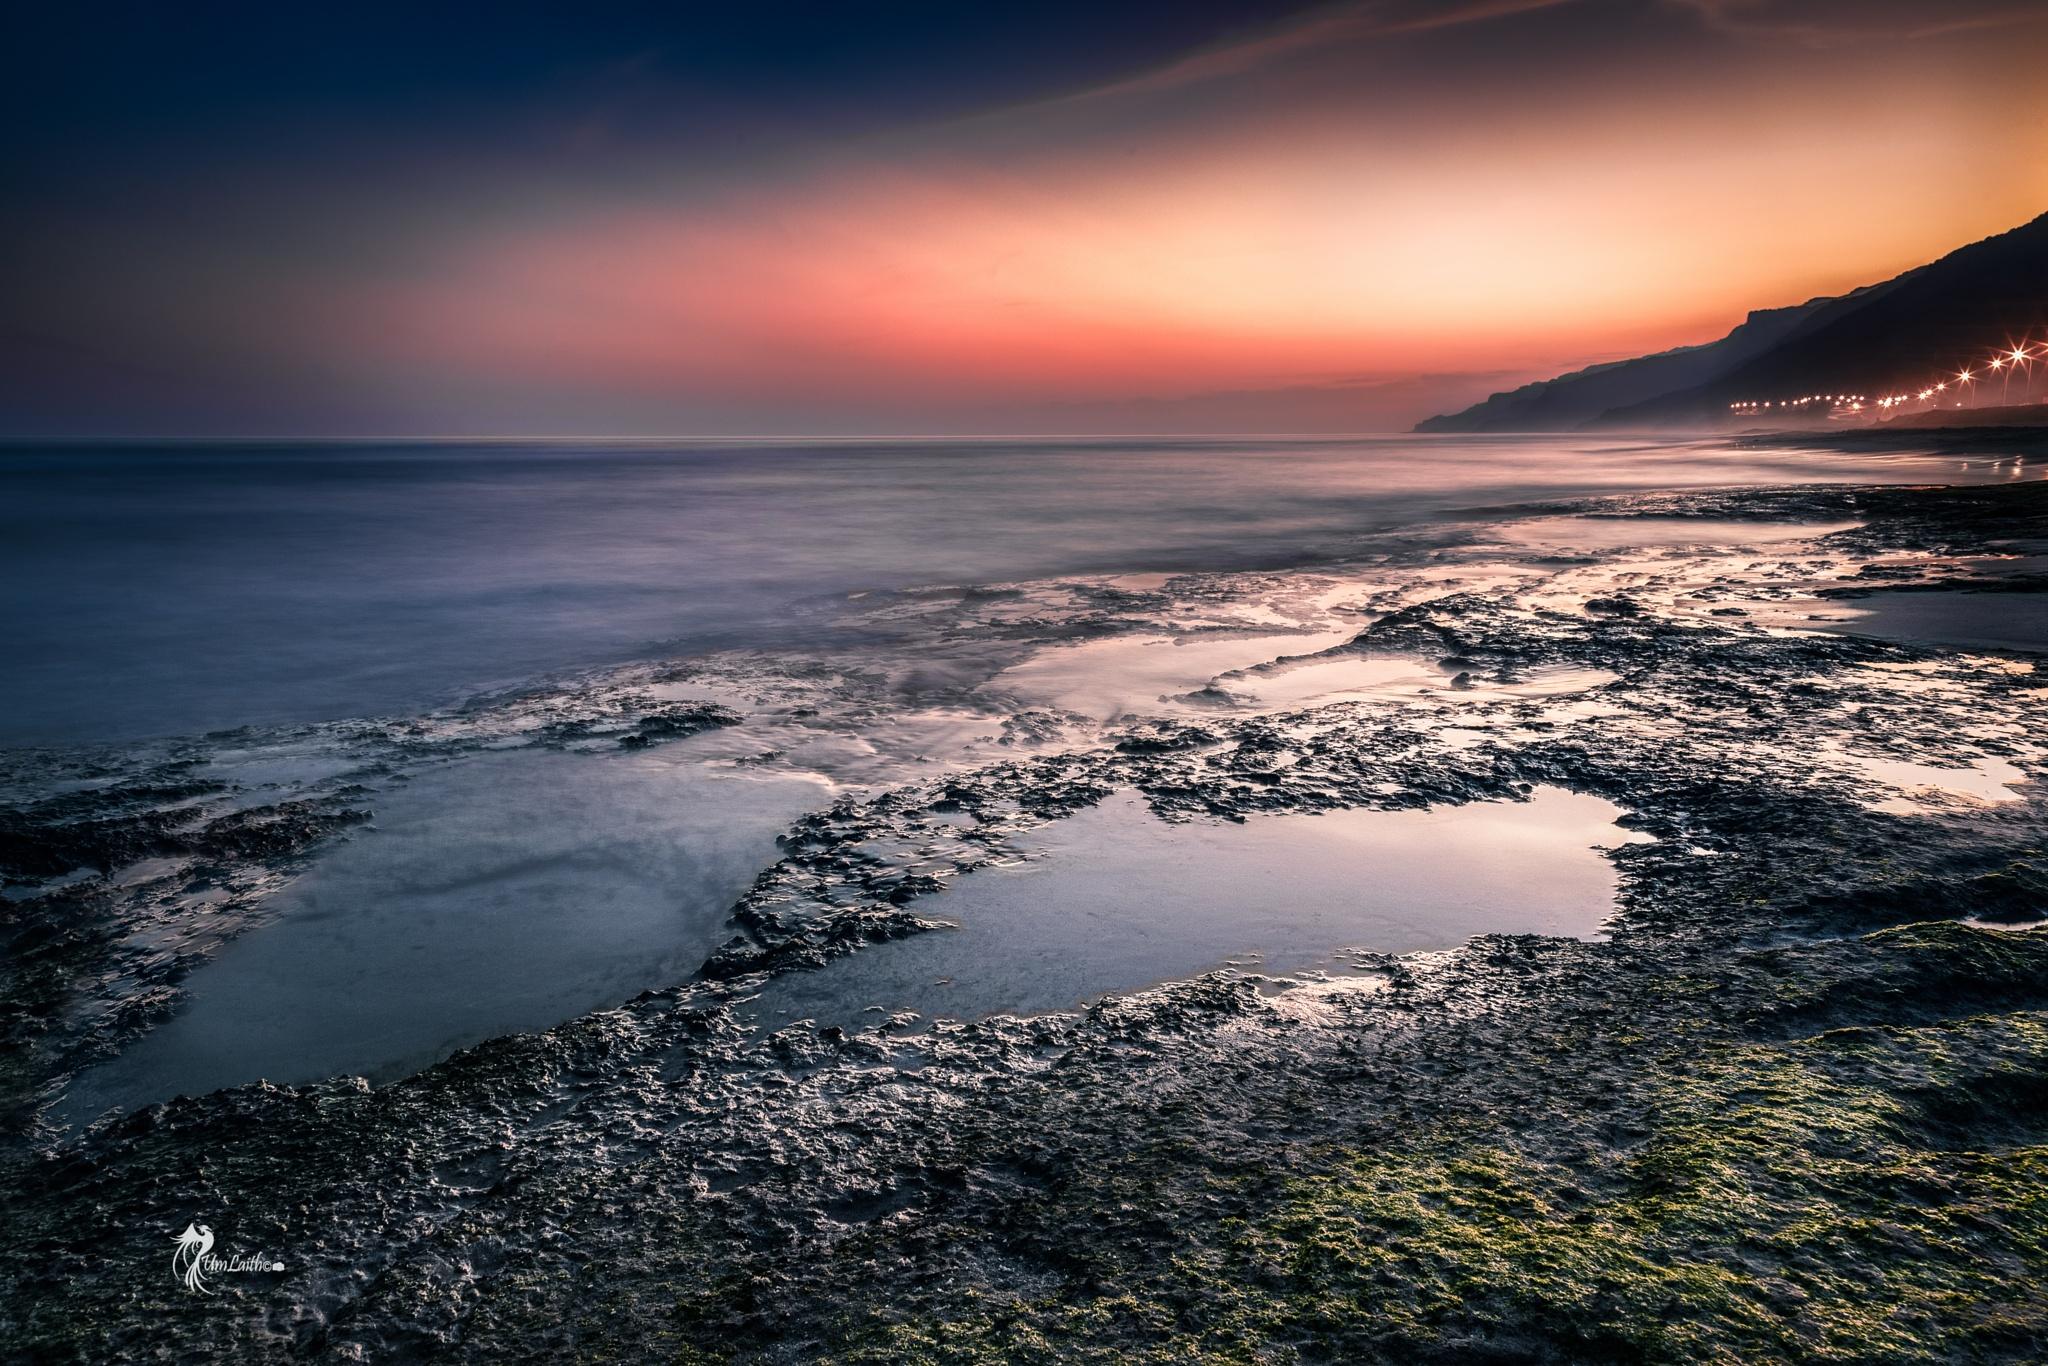 Sunset Reflection Games by Fatima Al-Amri